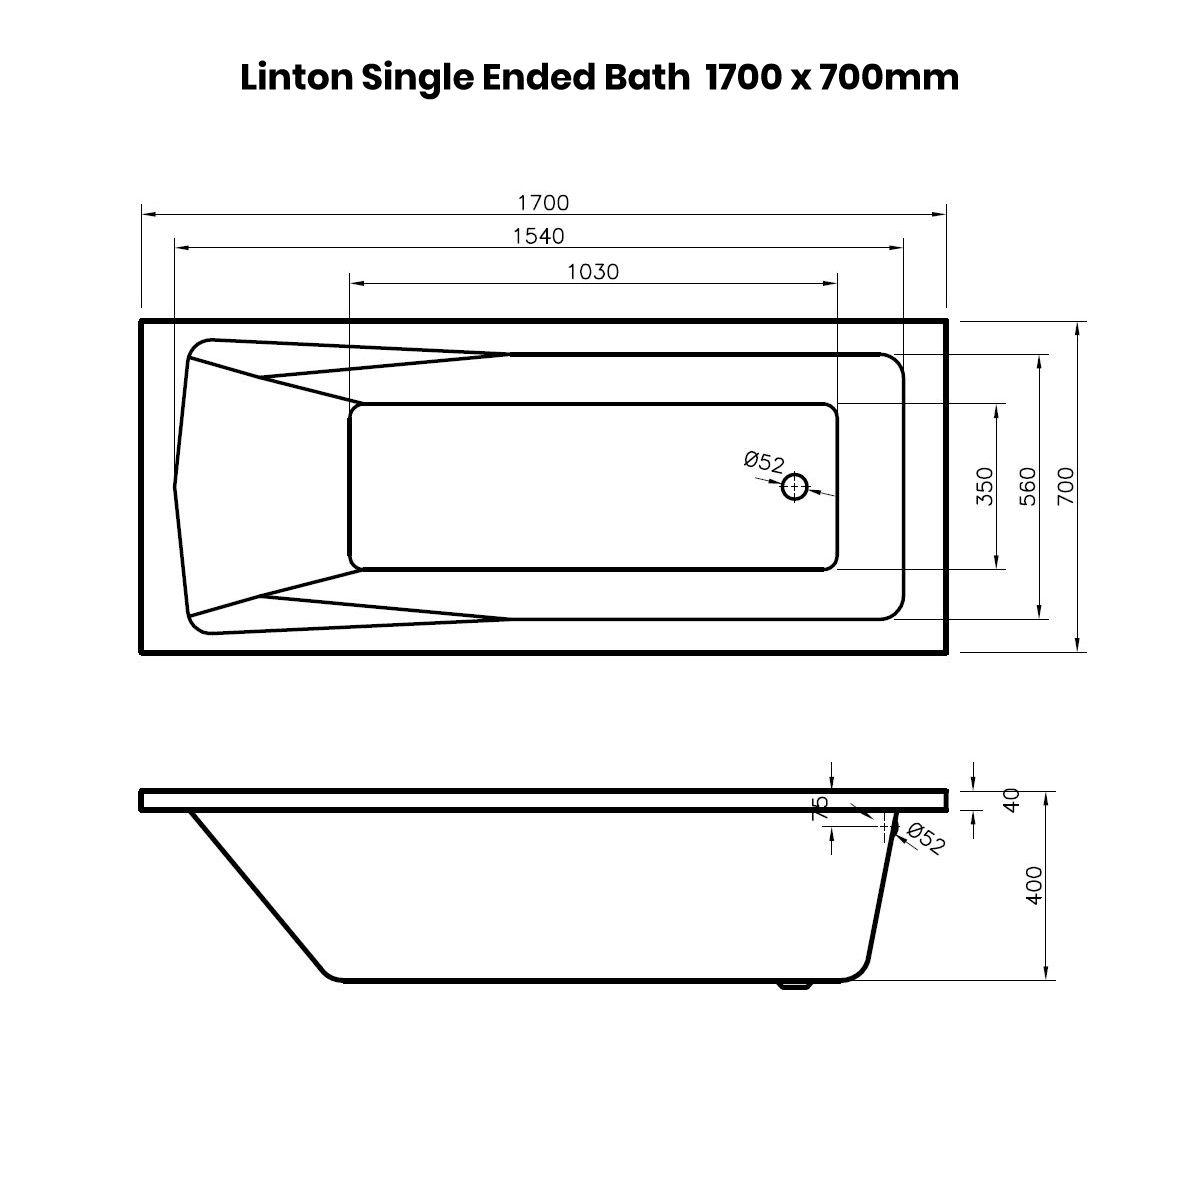 Nuie Linton Single Ended Bath 1700 x 700mm Dimensions